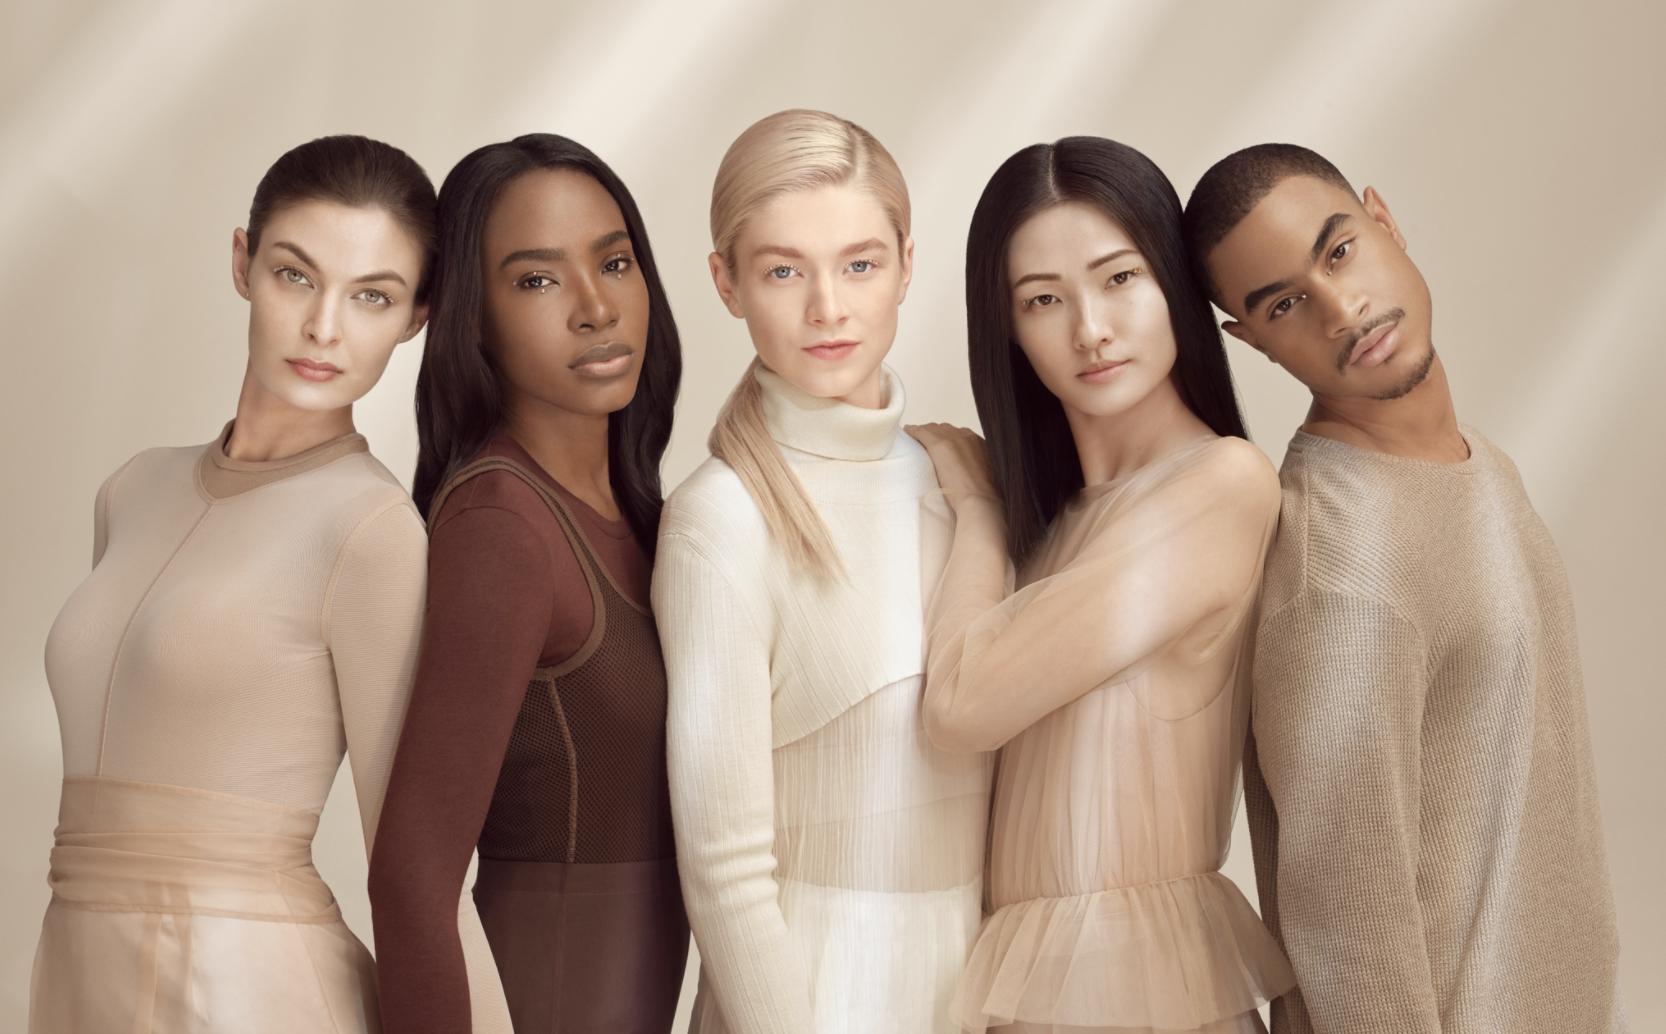 SHISEIDO's New Launch of Synchro Skin Radiant Lifting Foundation, Starring Newest Global Makeup Ambassador Hunter Schafer